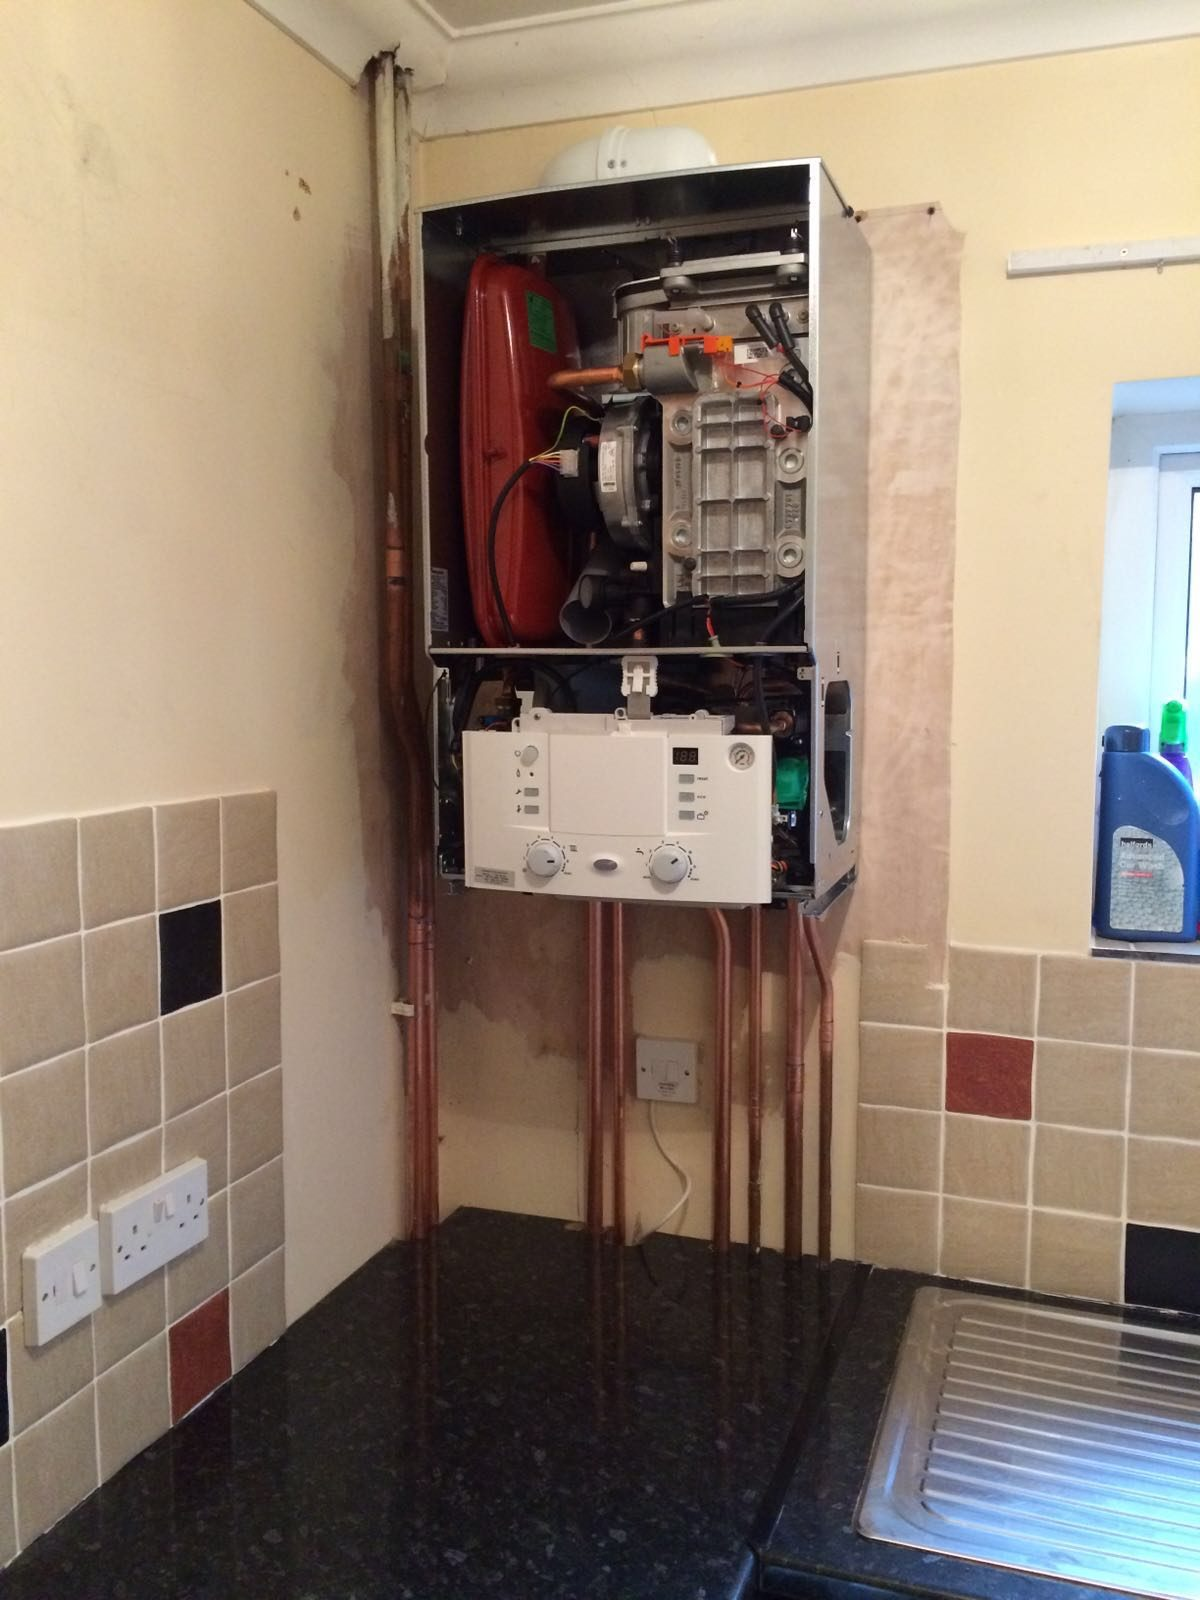 Here4Heat-Worcester-Bosch-Chichester-Combination-Boiler-Change-During-Image-1-1200x1600.jpg